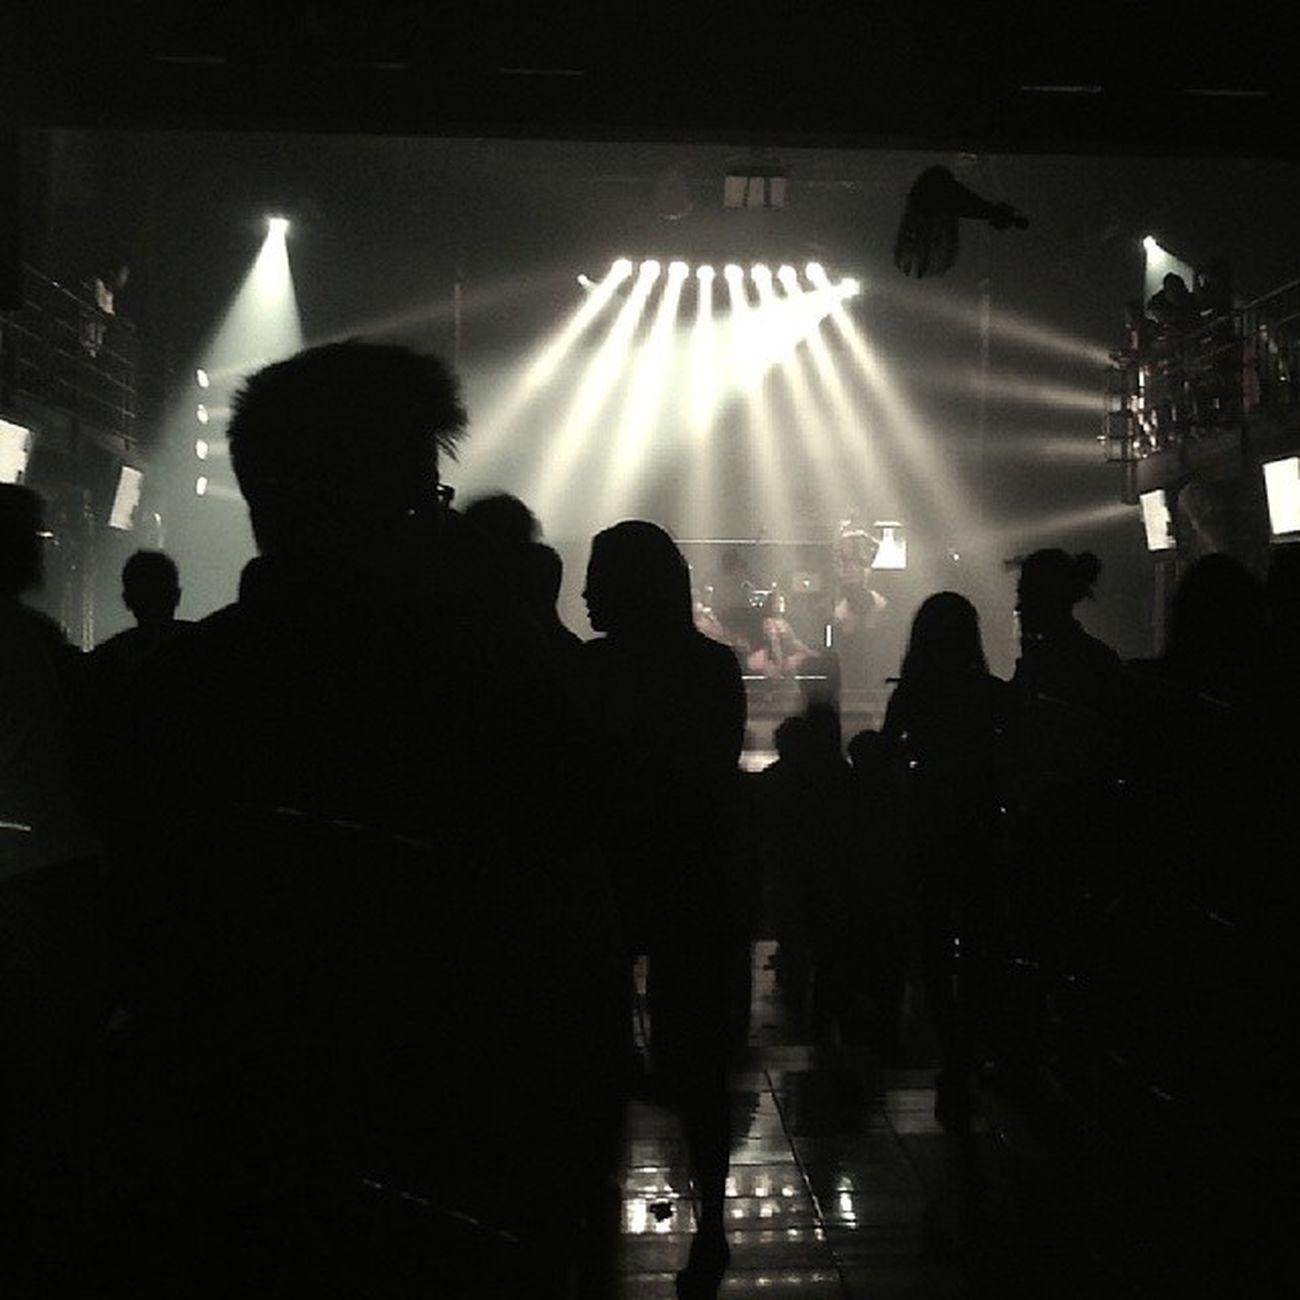 new year party eve Nightclub Cheersnep Newyeareve Party dj ozvaldonugroho sexydancer